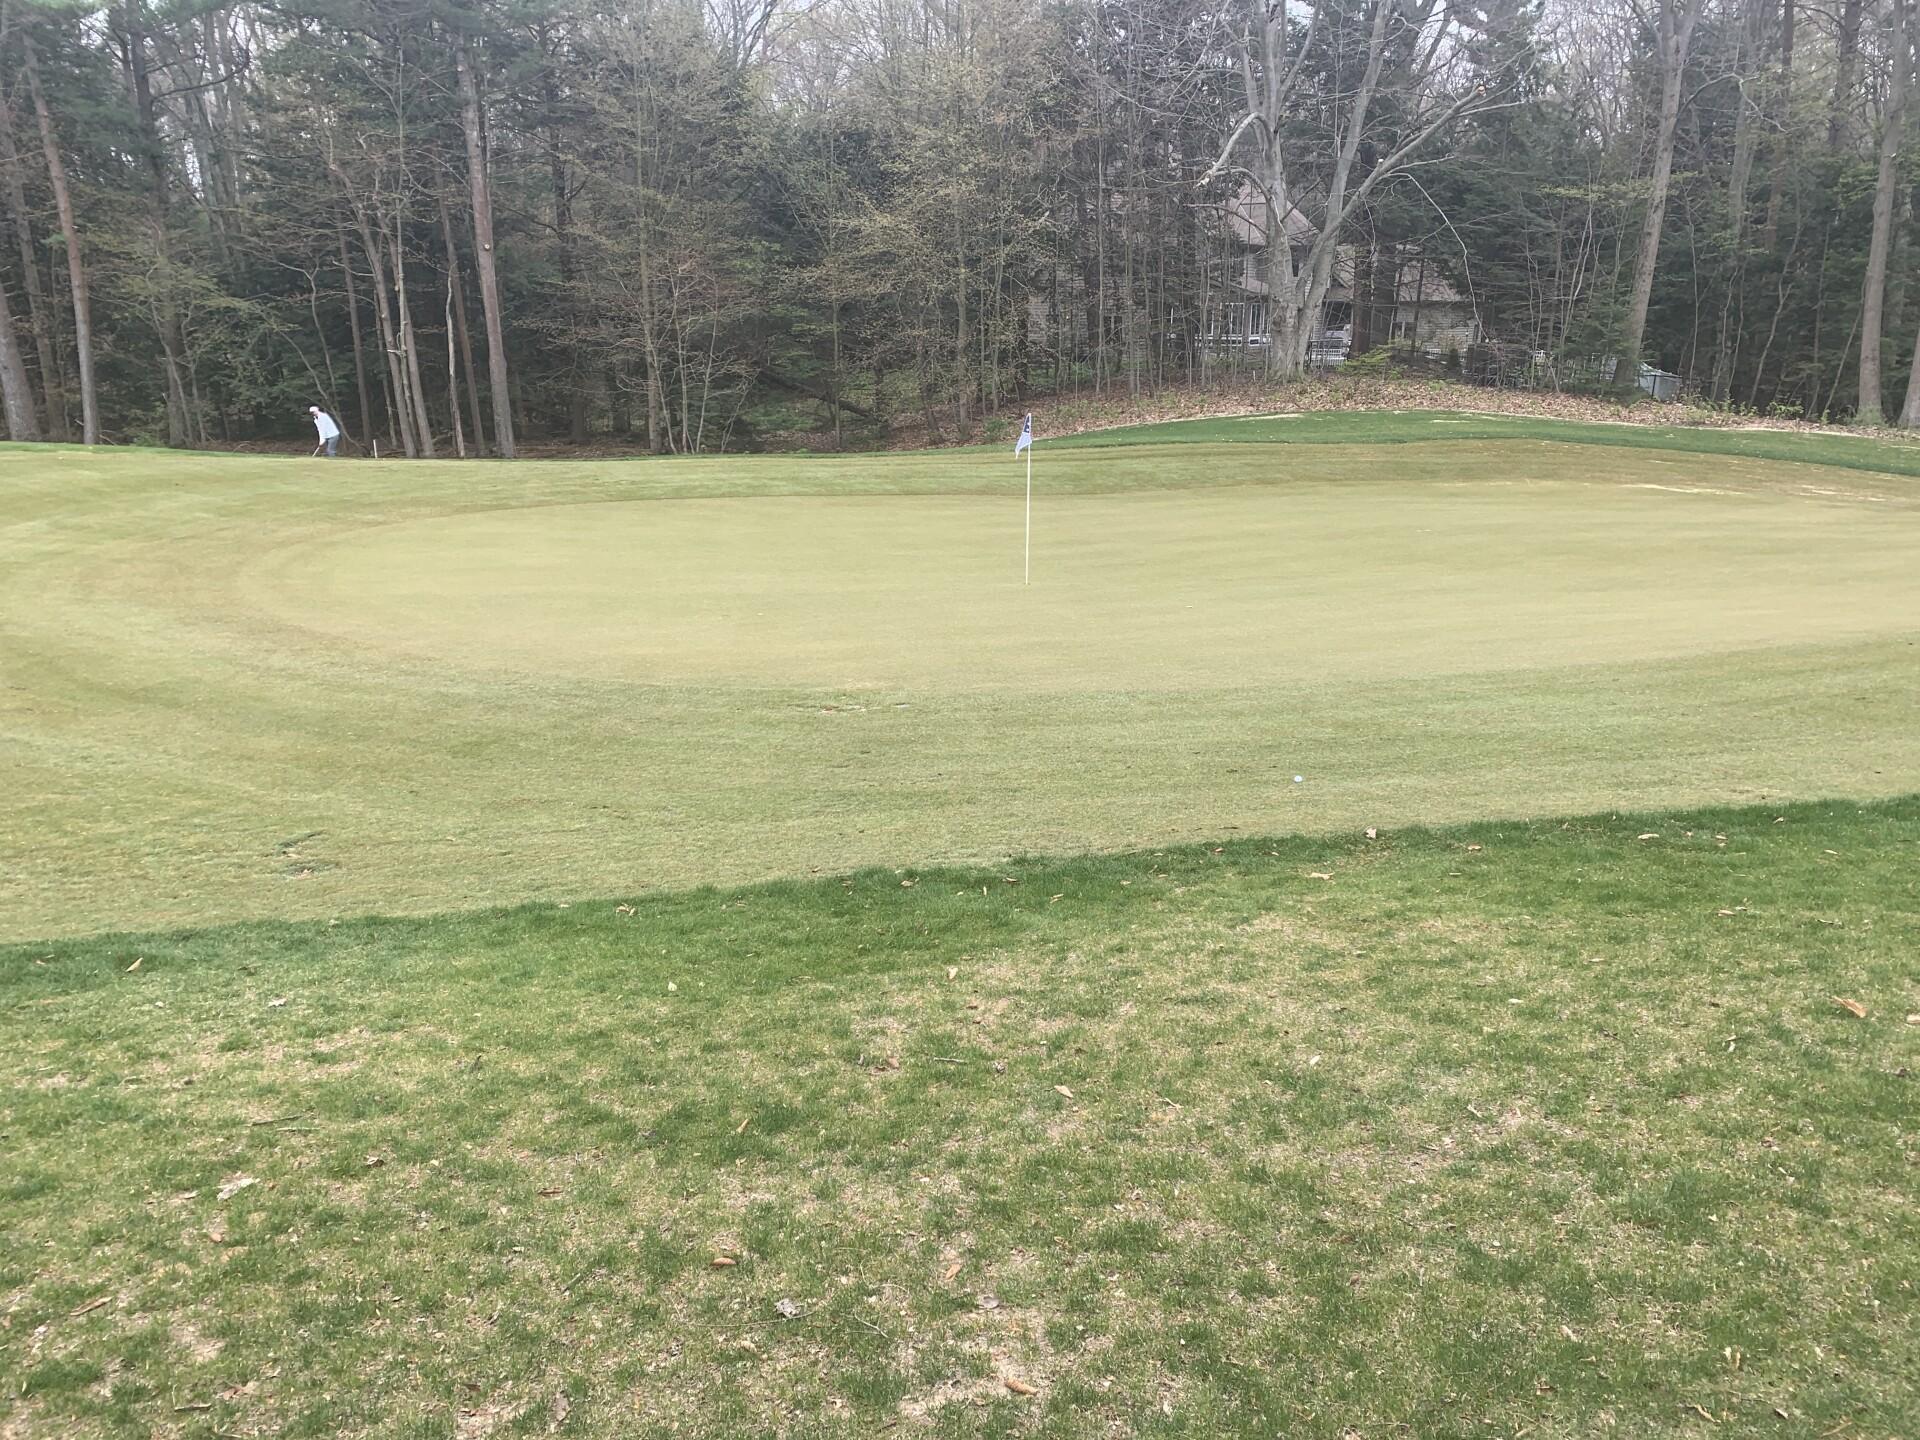 American-Dunes-Golf-Club-31.JPG